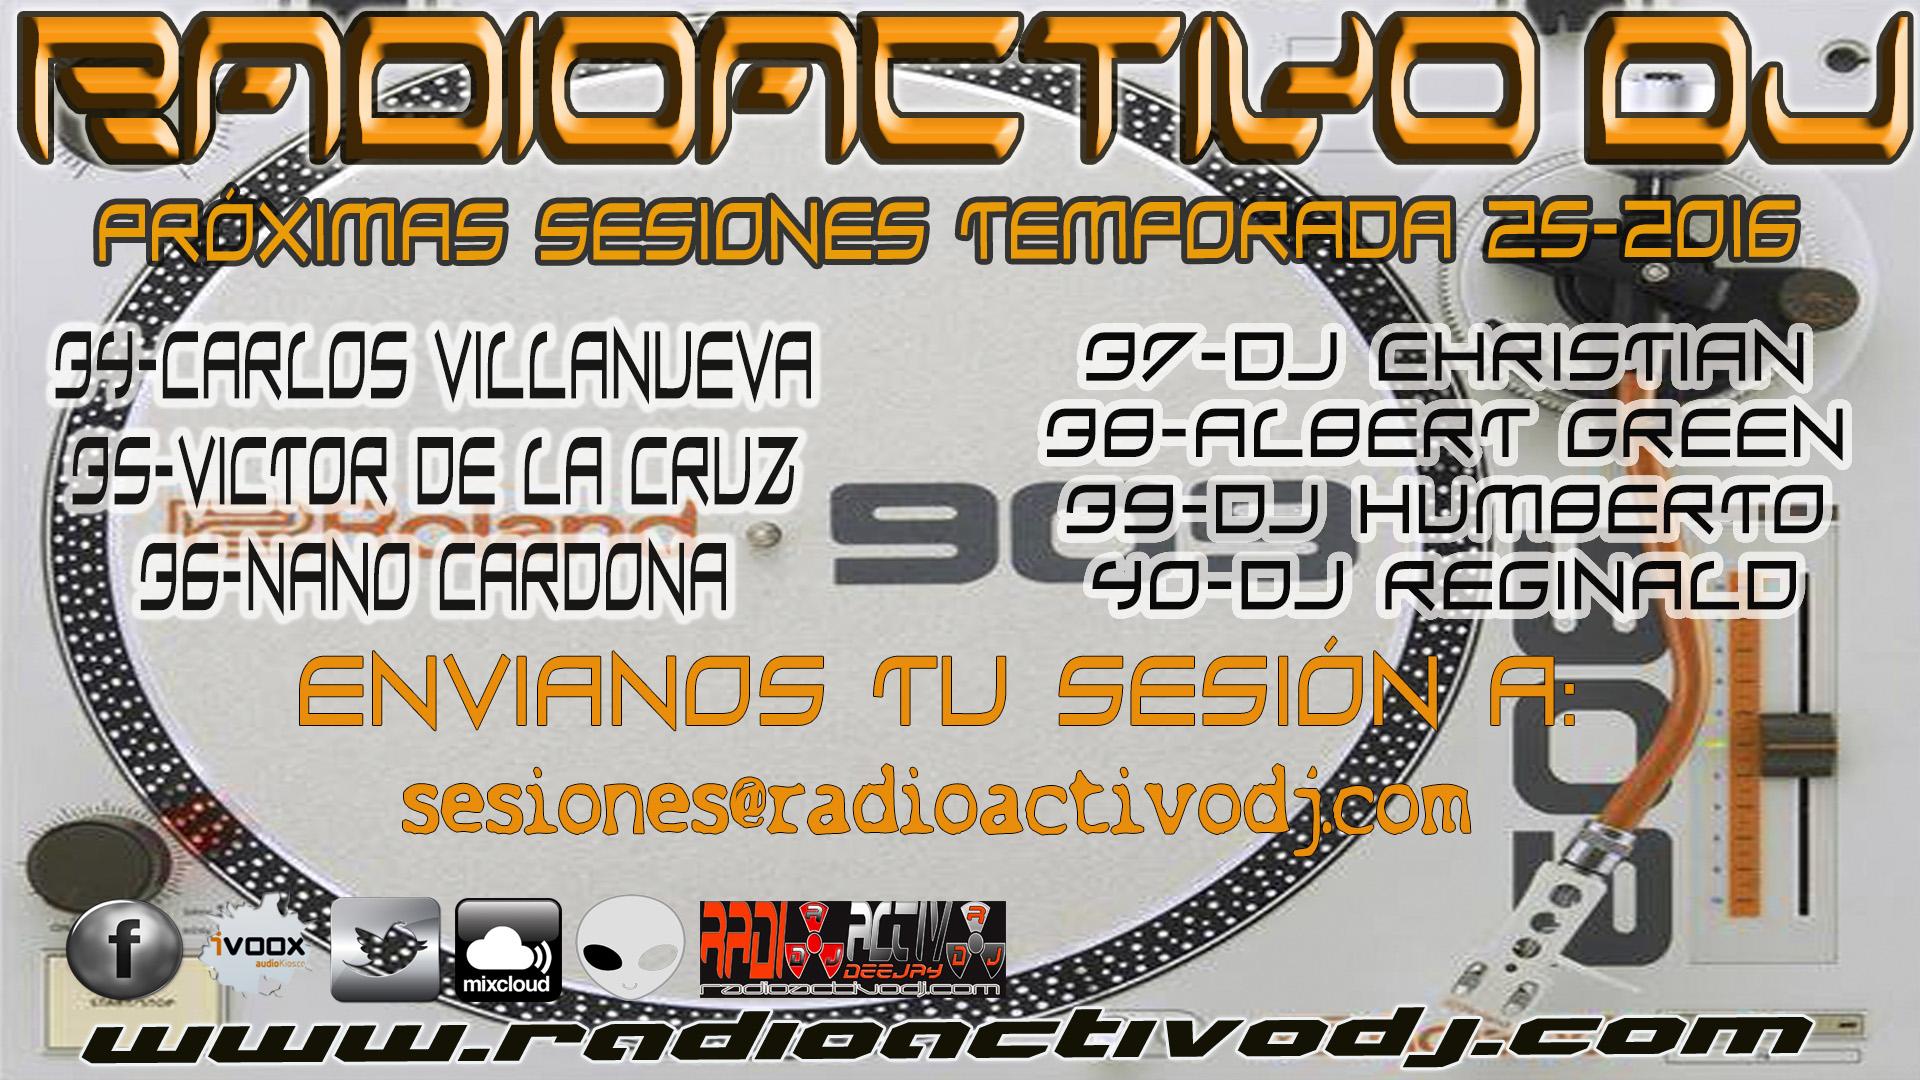 RADIOACTIVO-DJ-SESSIONS-2016-temp-25-4